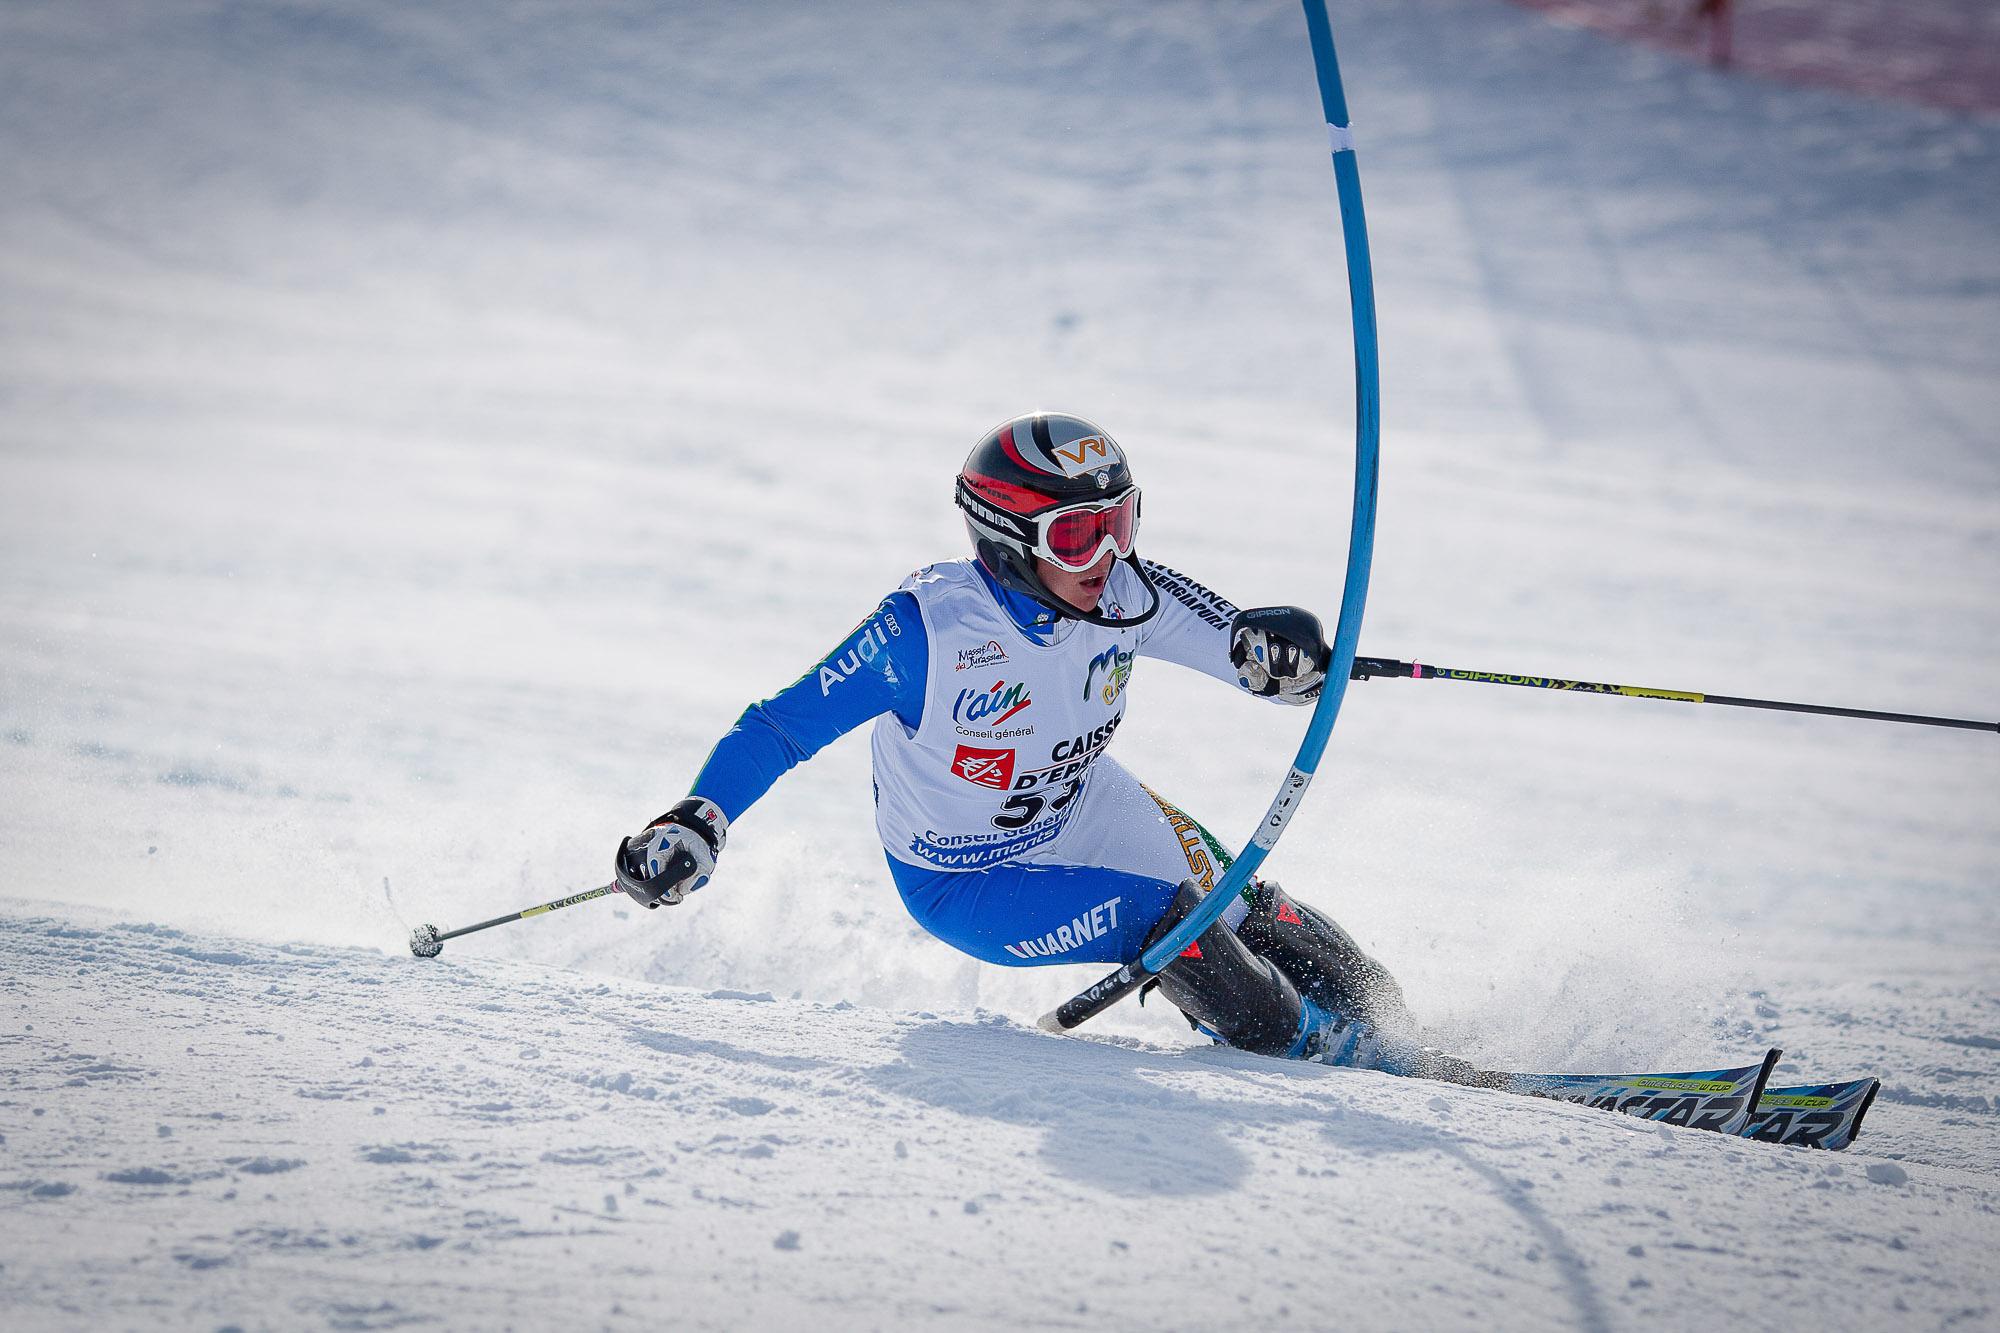 Coupe_Europe_ski_dames-441.jpg